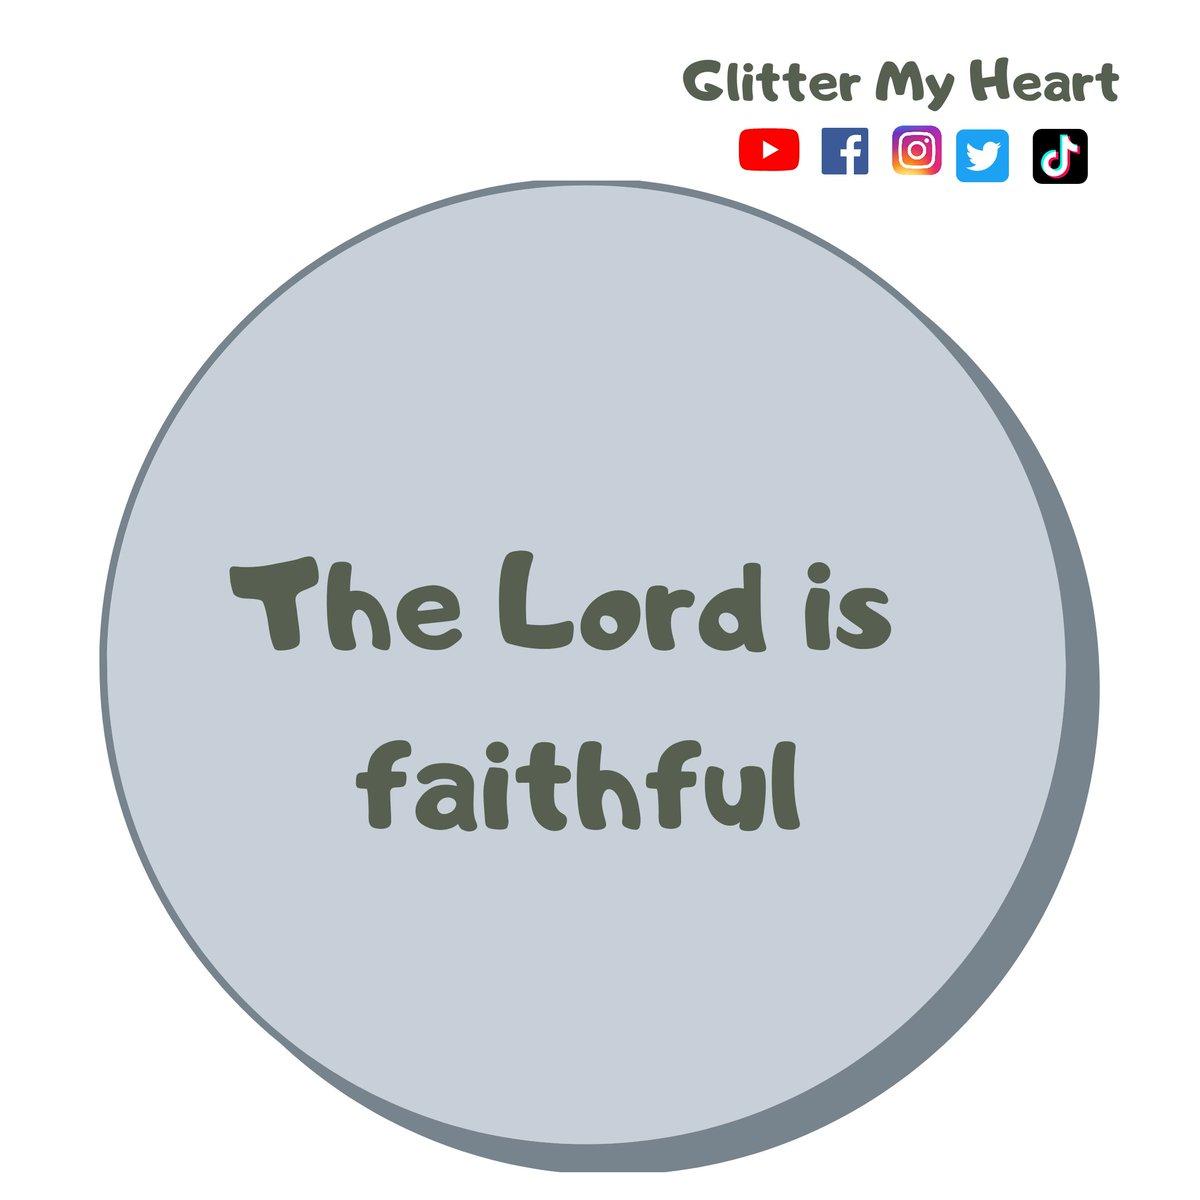 #God #faith #hope #childofGod #Christian #youtube #Glitter #Glittermyheart #reflection #christianreflection